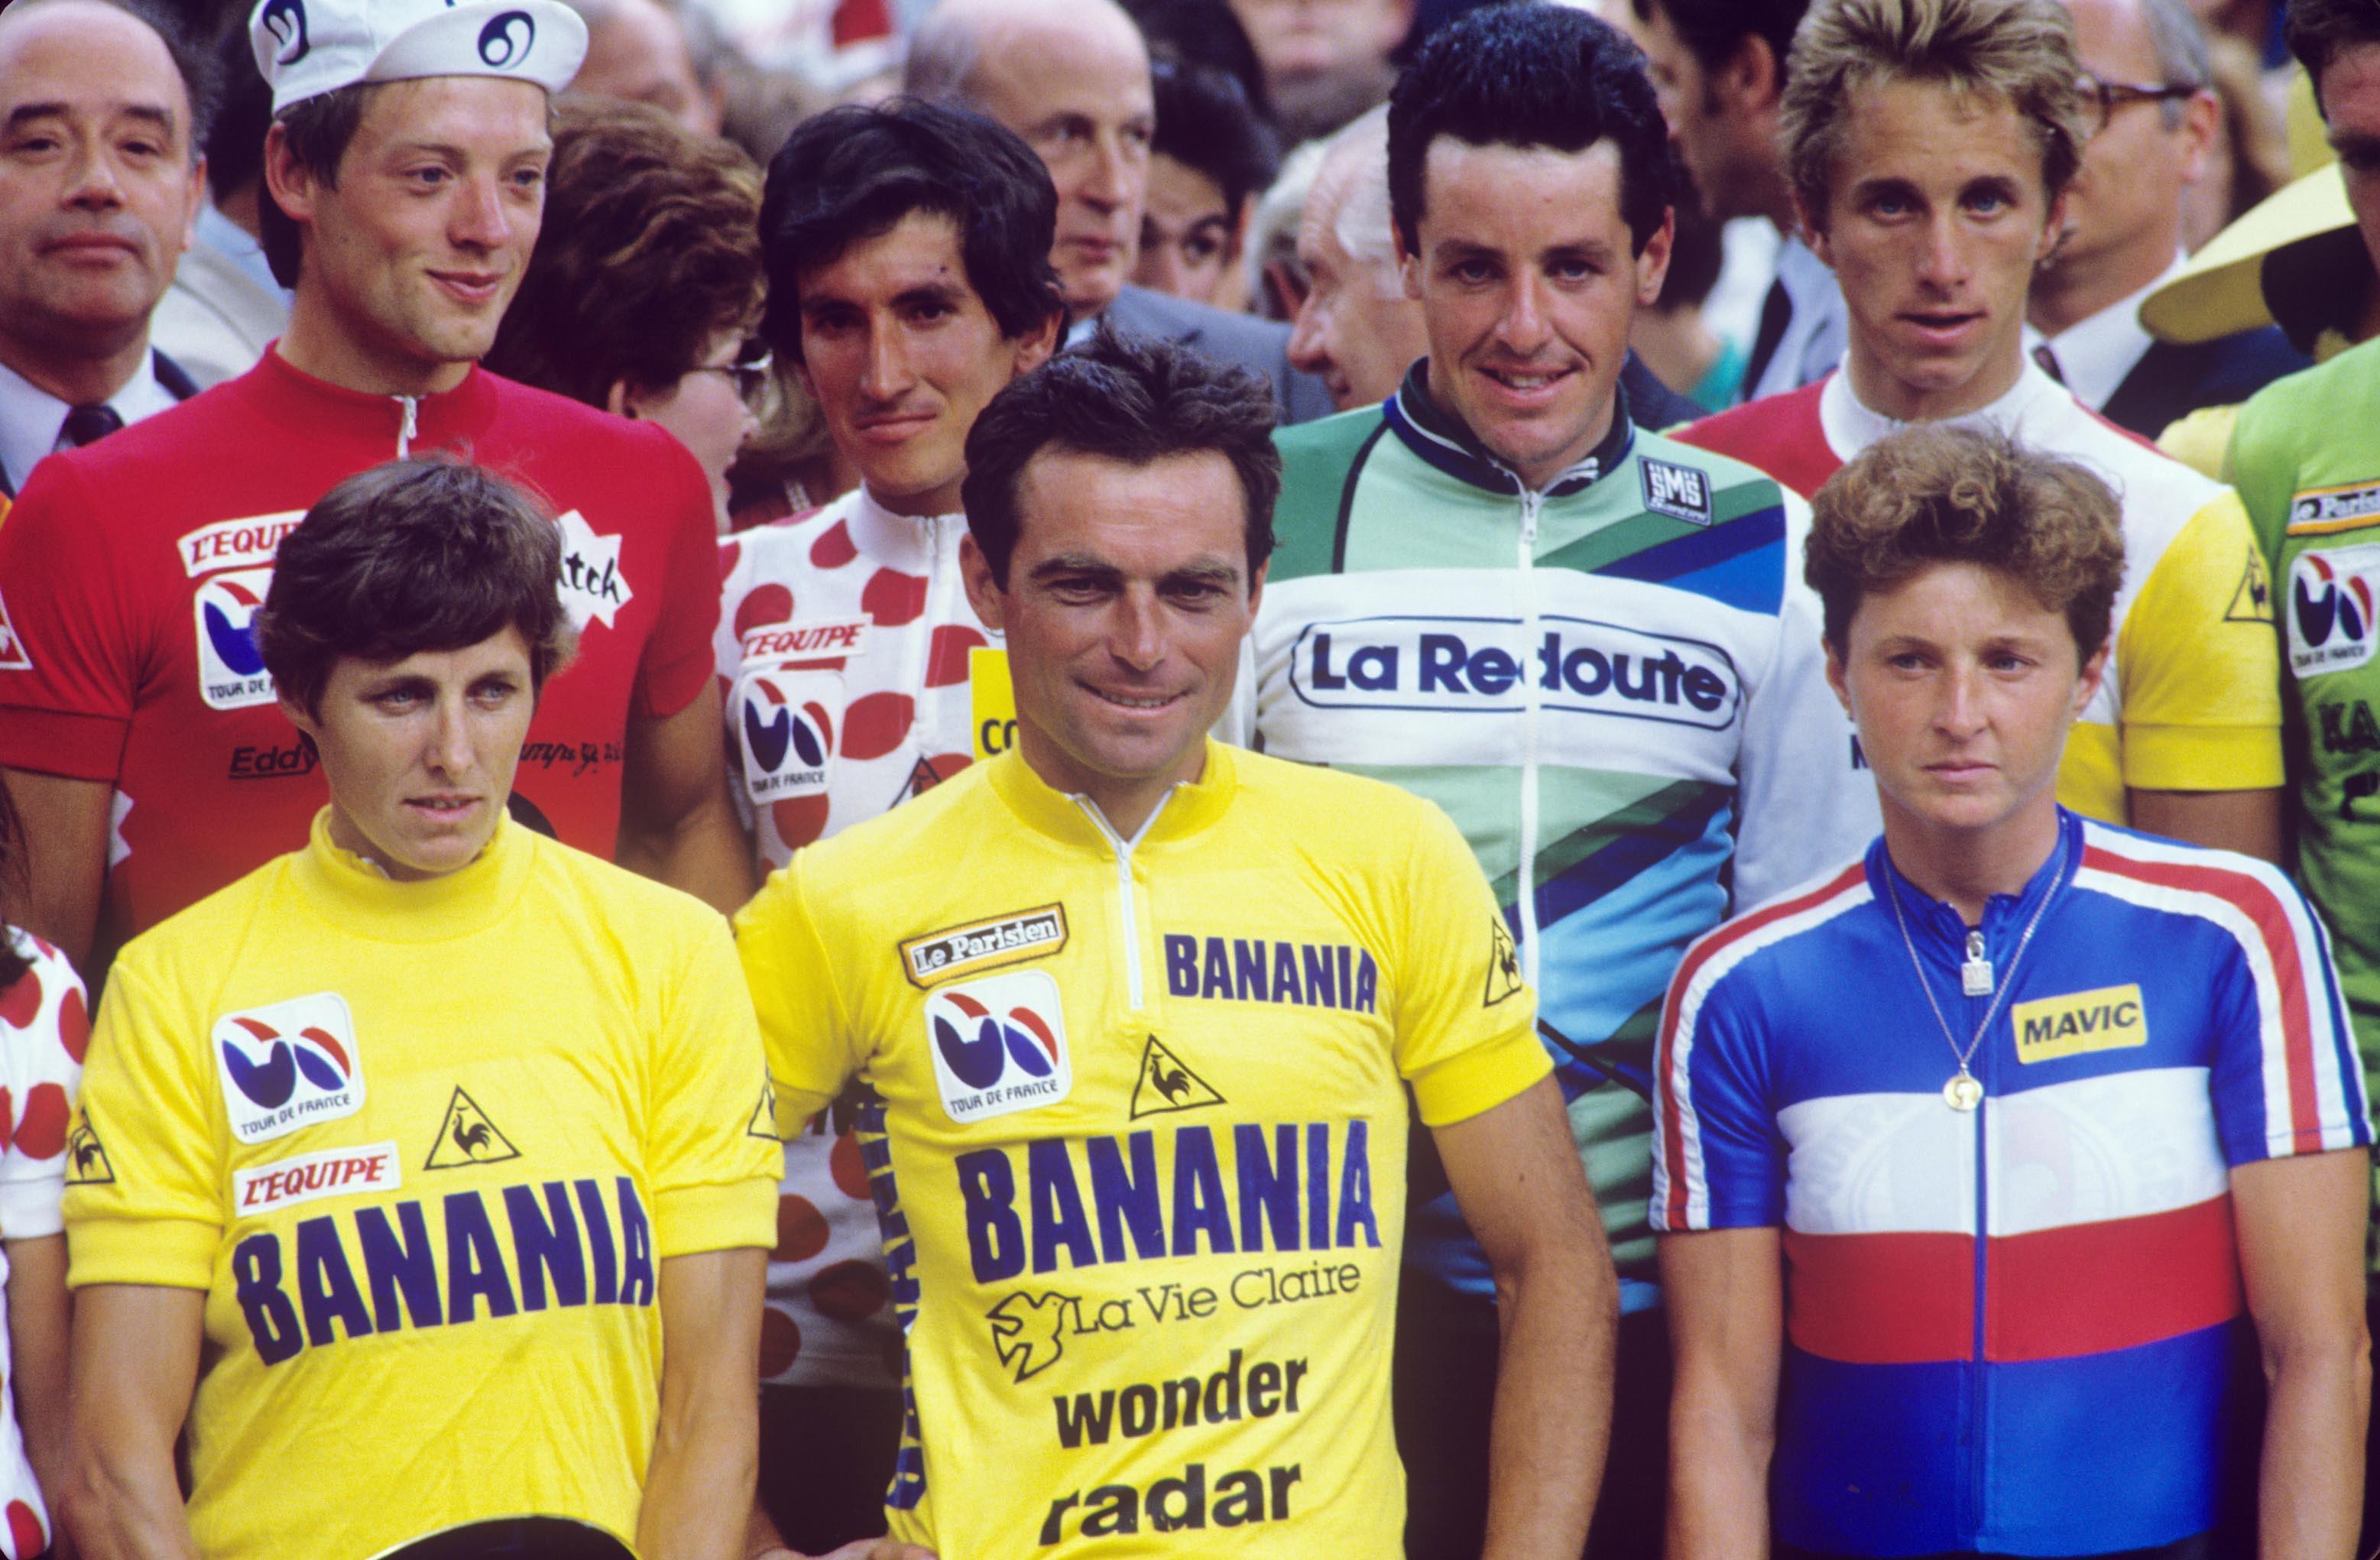 CYCLISME - TOUR DE FRANCE 1985 - 1985 canins (maria) - (ita) - hinault (bernard) - (fra) - damiani (dominique) - (fra) - lieckens (jos) - (bel) - herrera (luis) - (col) - roche (stephen) - (irl) - lemond (greg) - (usa) -